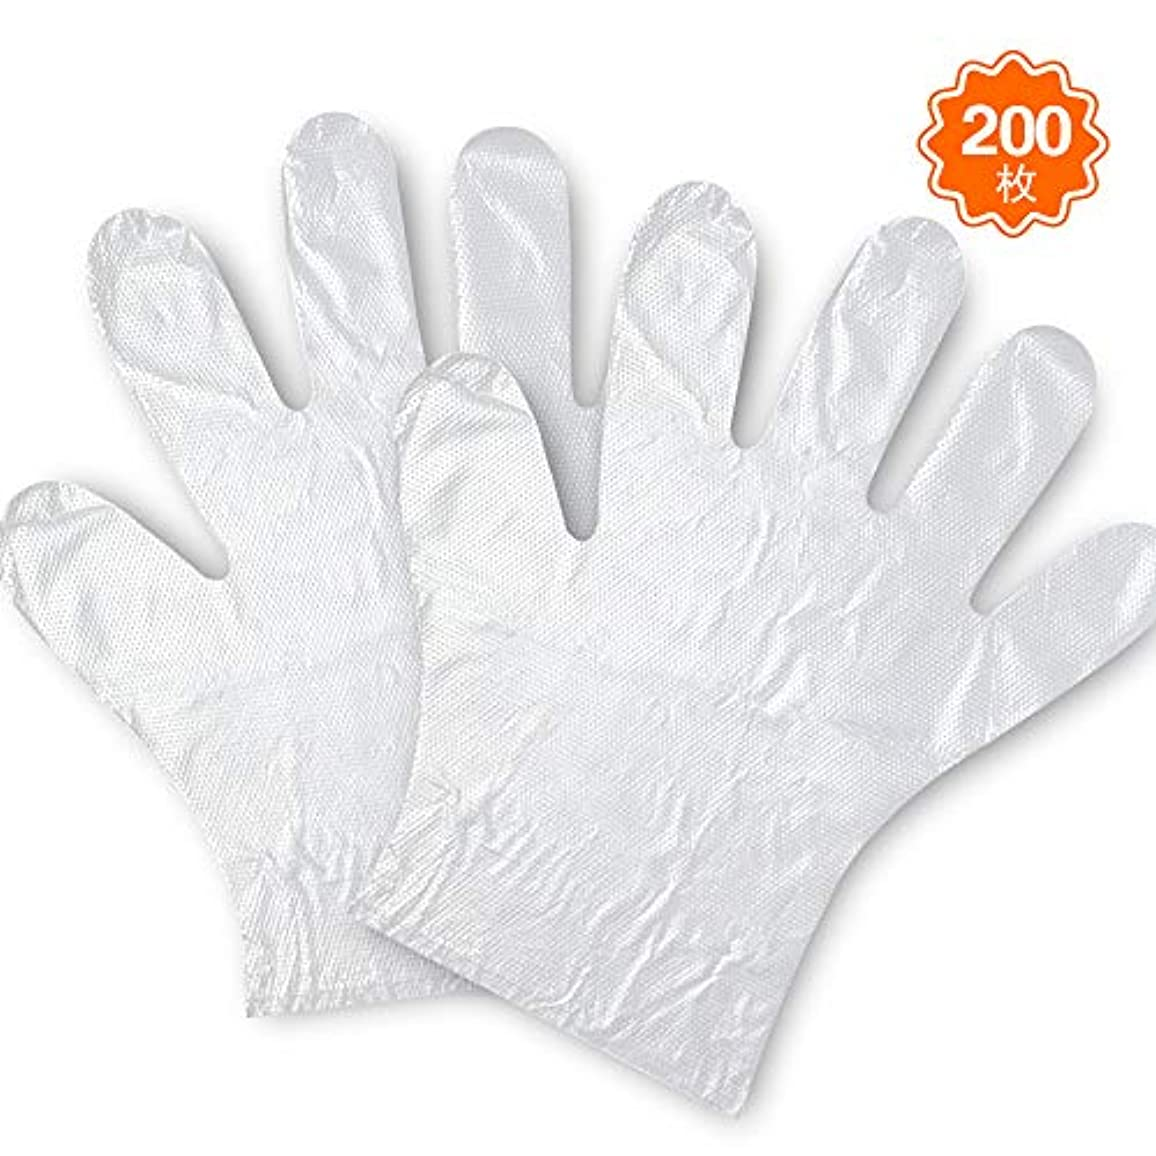 FanDaMei 使い捨てポリ手袋 200枚 使いきり手袋 ポリエチレン 使い捨て手袋 極薄手袋 調理に?お掃除に?毛染めに 食品衛生法適合